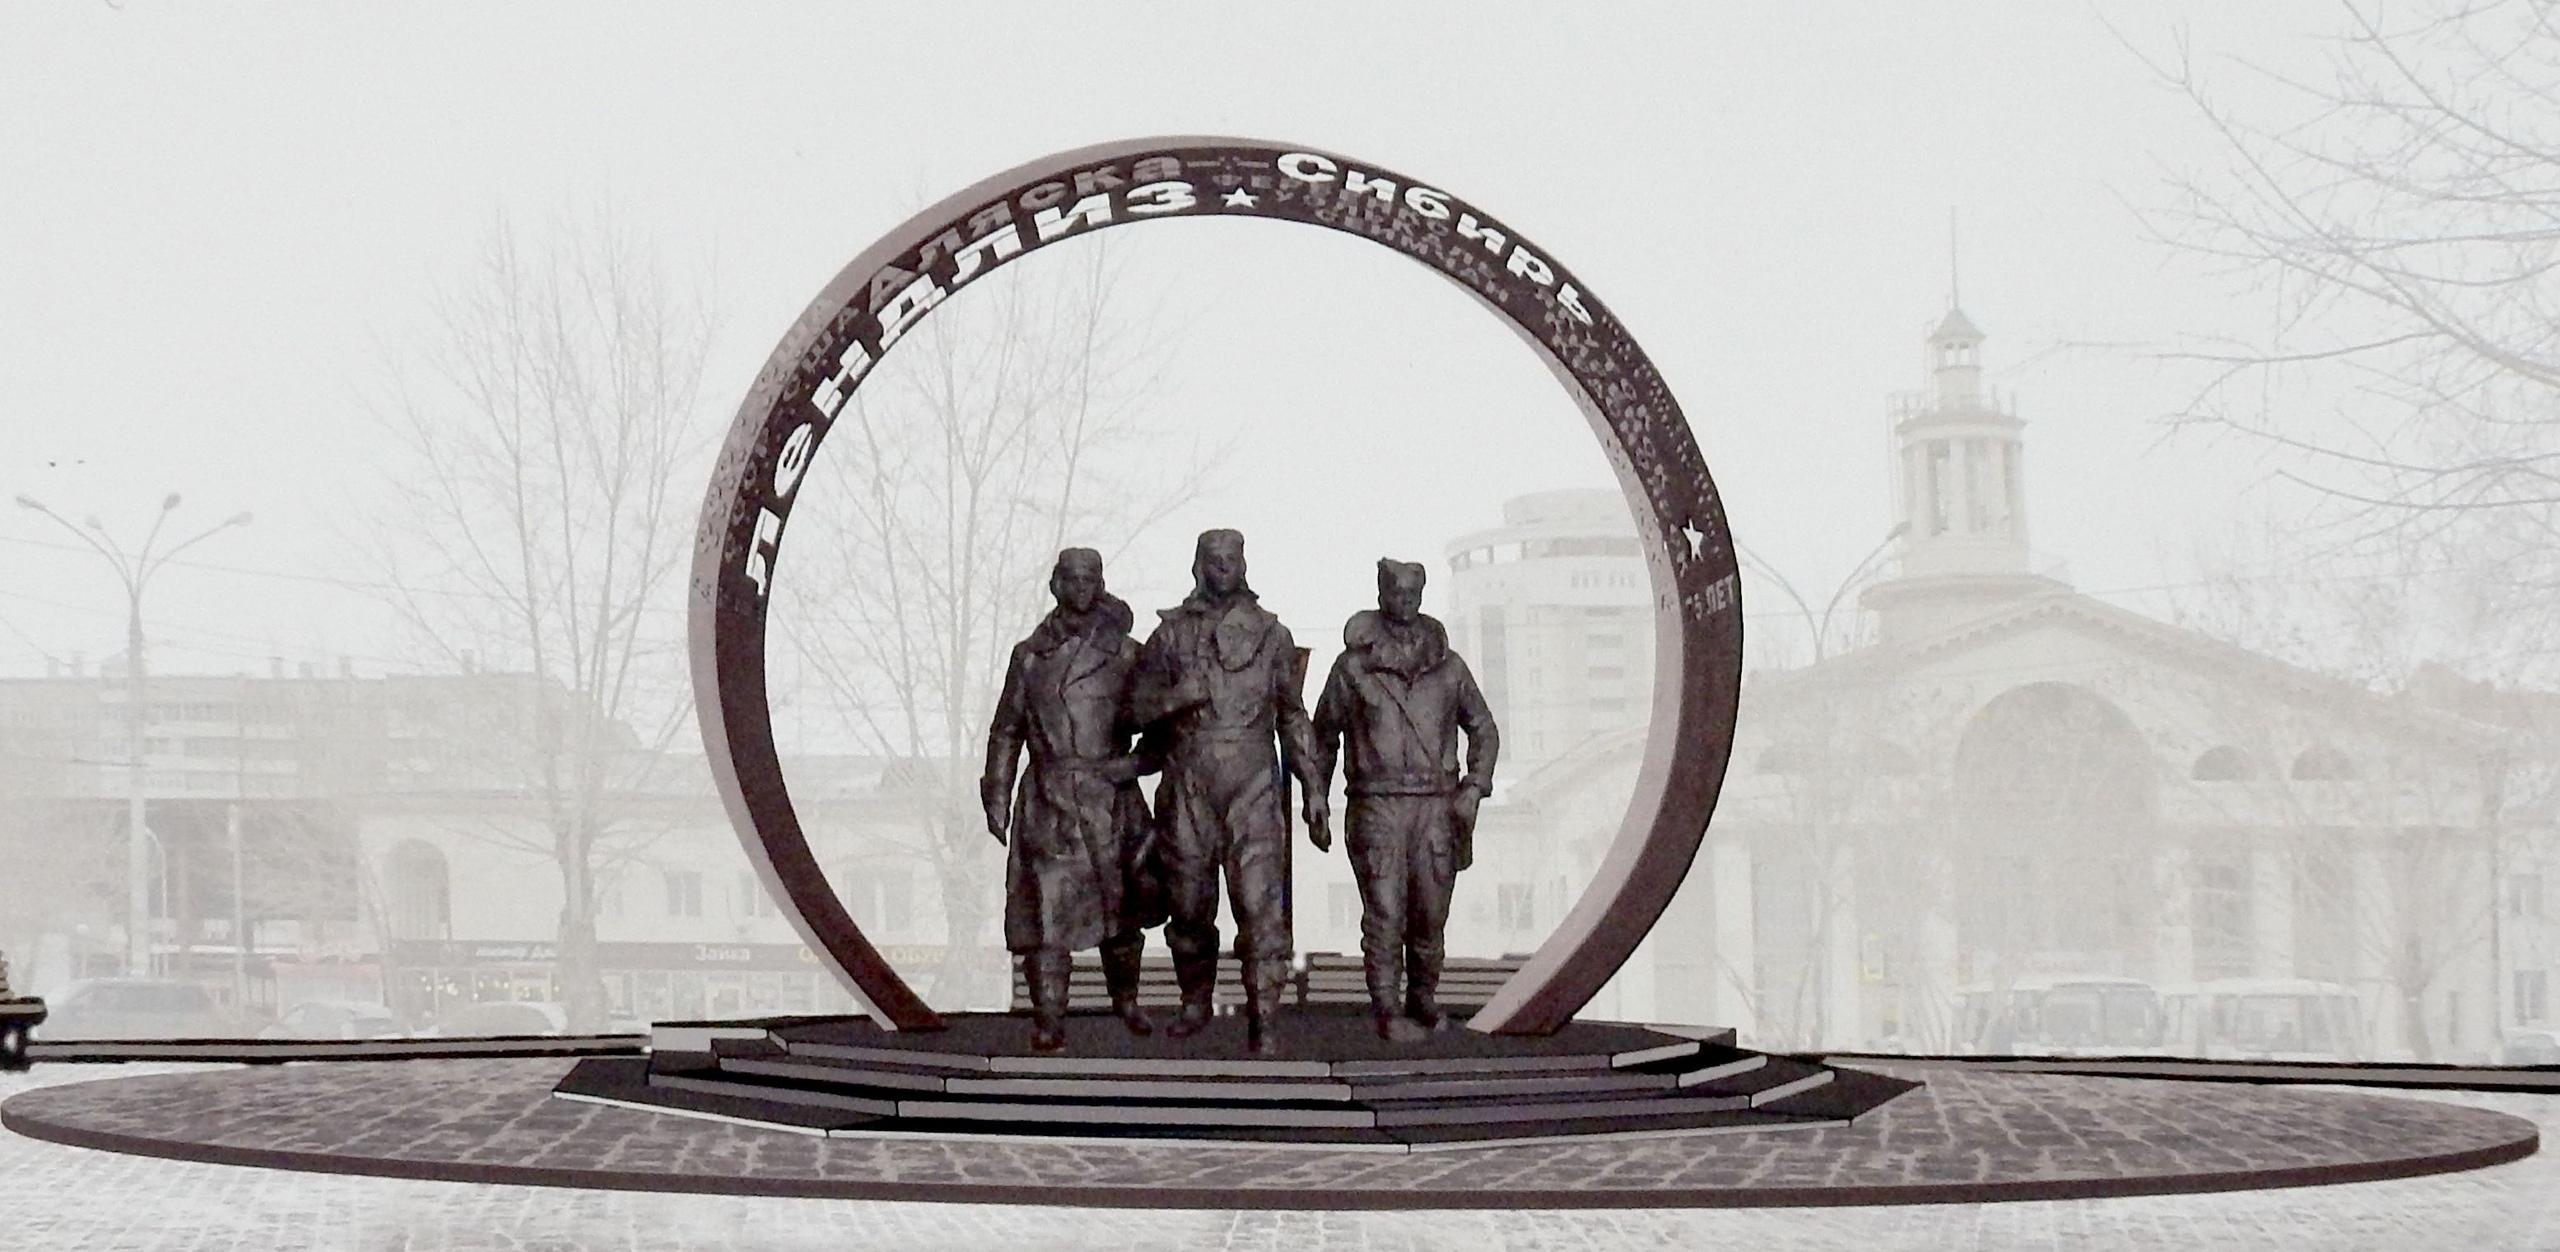 В Красноярске выбрали проект памятника героям АлСиба | РВИО | РВИО